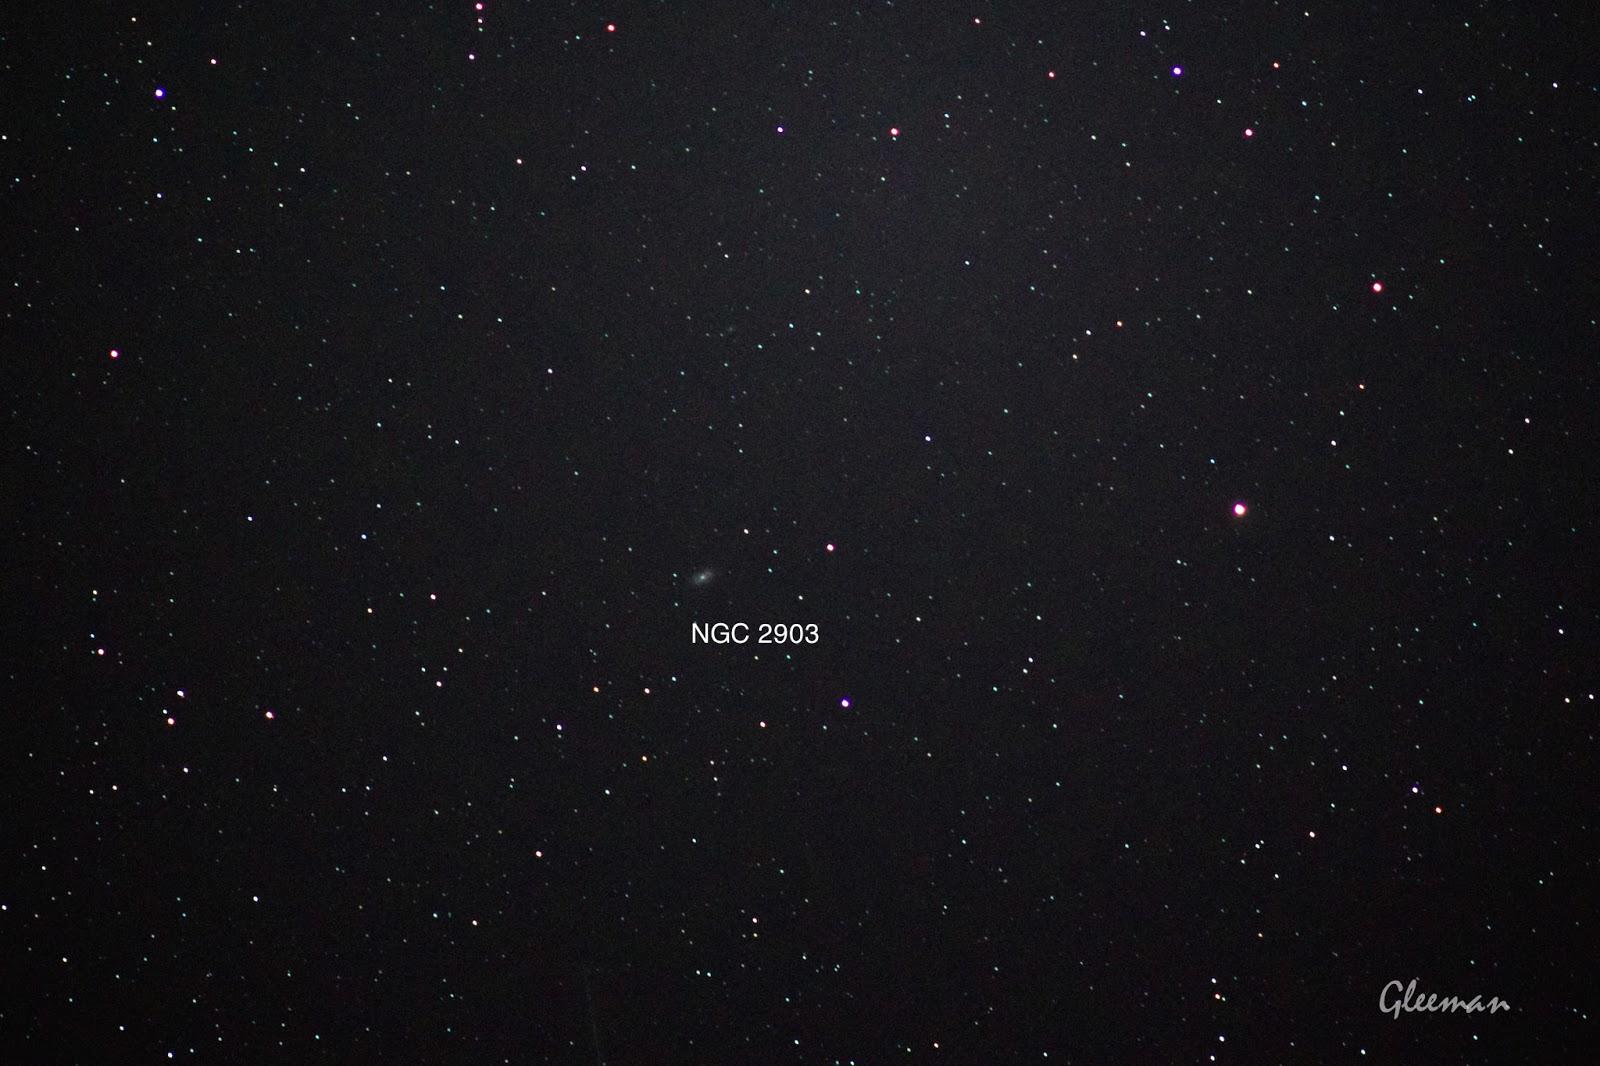 NGC 2903/ Pentax  K5 + Pentax O-GPS1 + DA*200